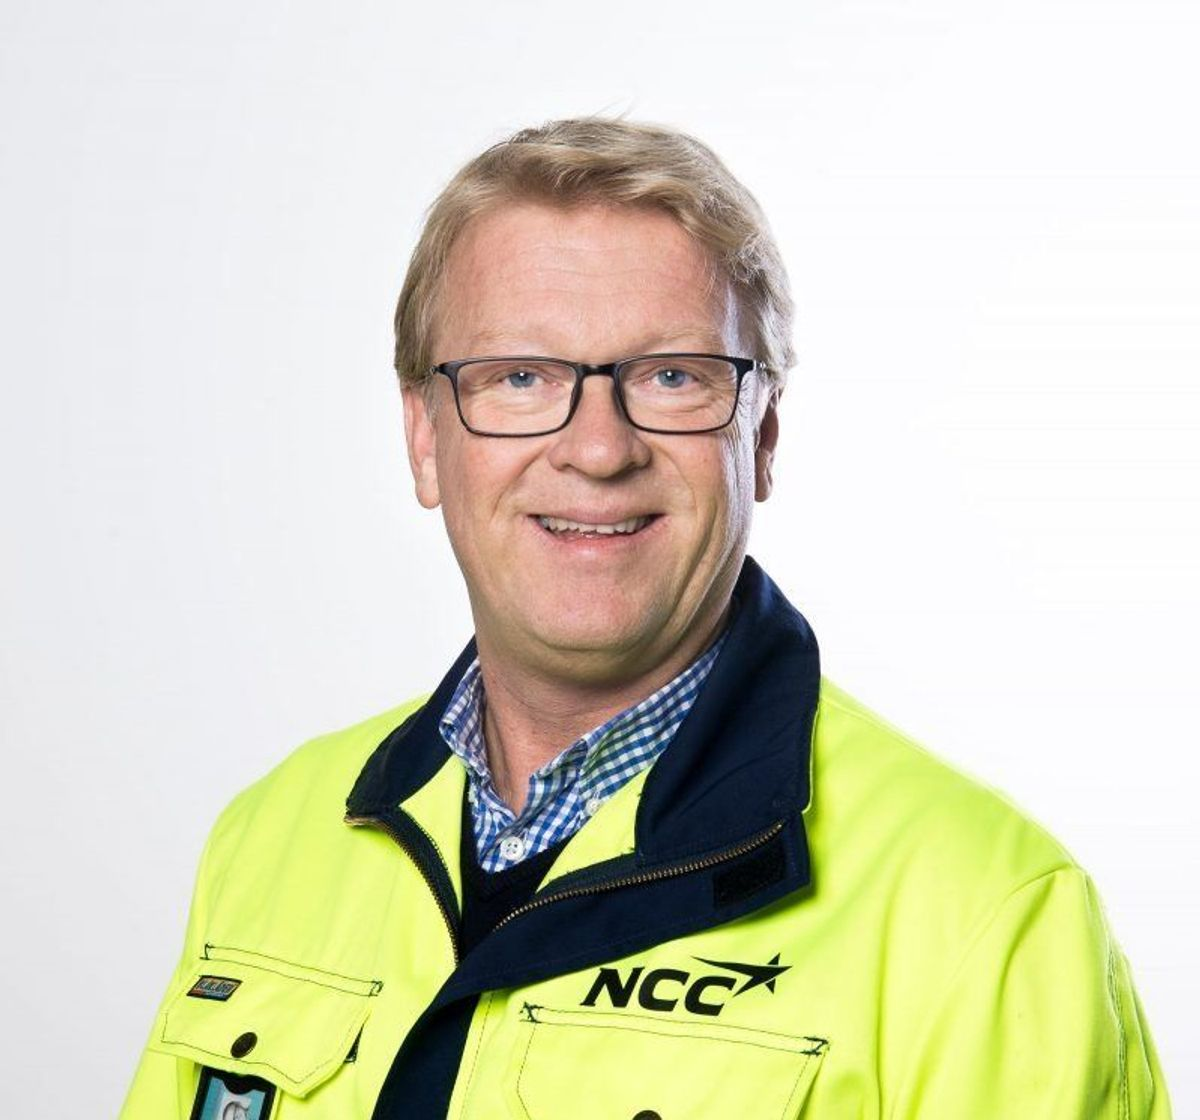 HMS-sjef i NCC Infrastructure, Morten Larsen. Foto: NCC